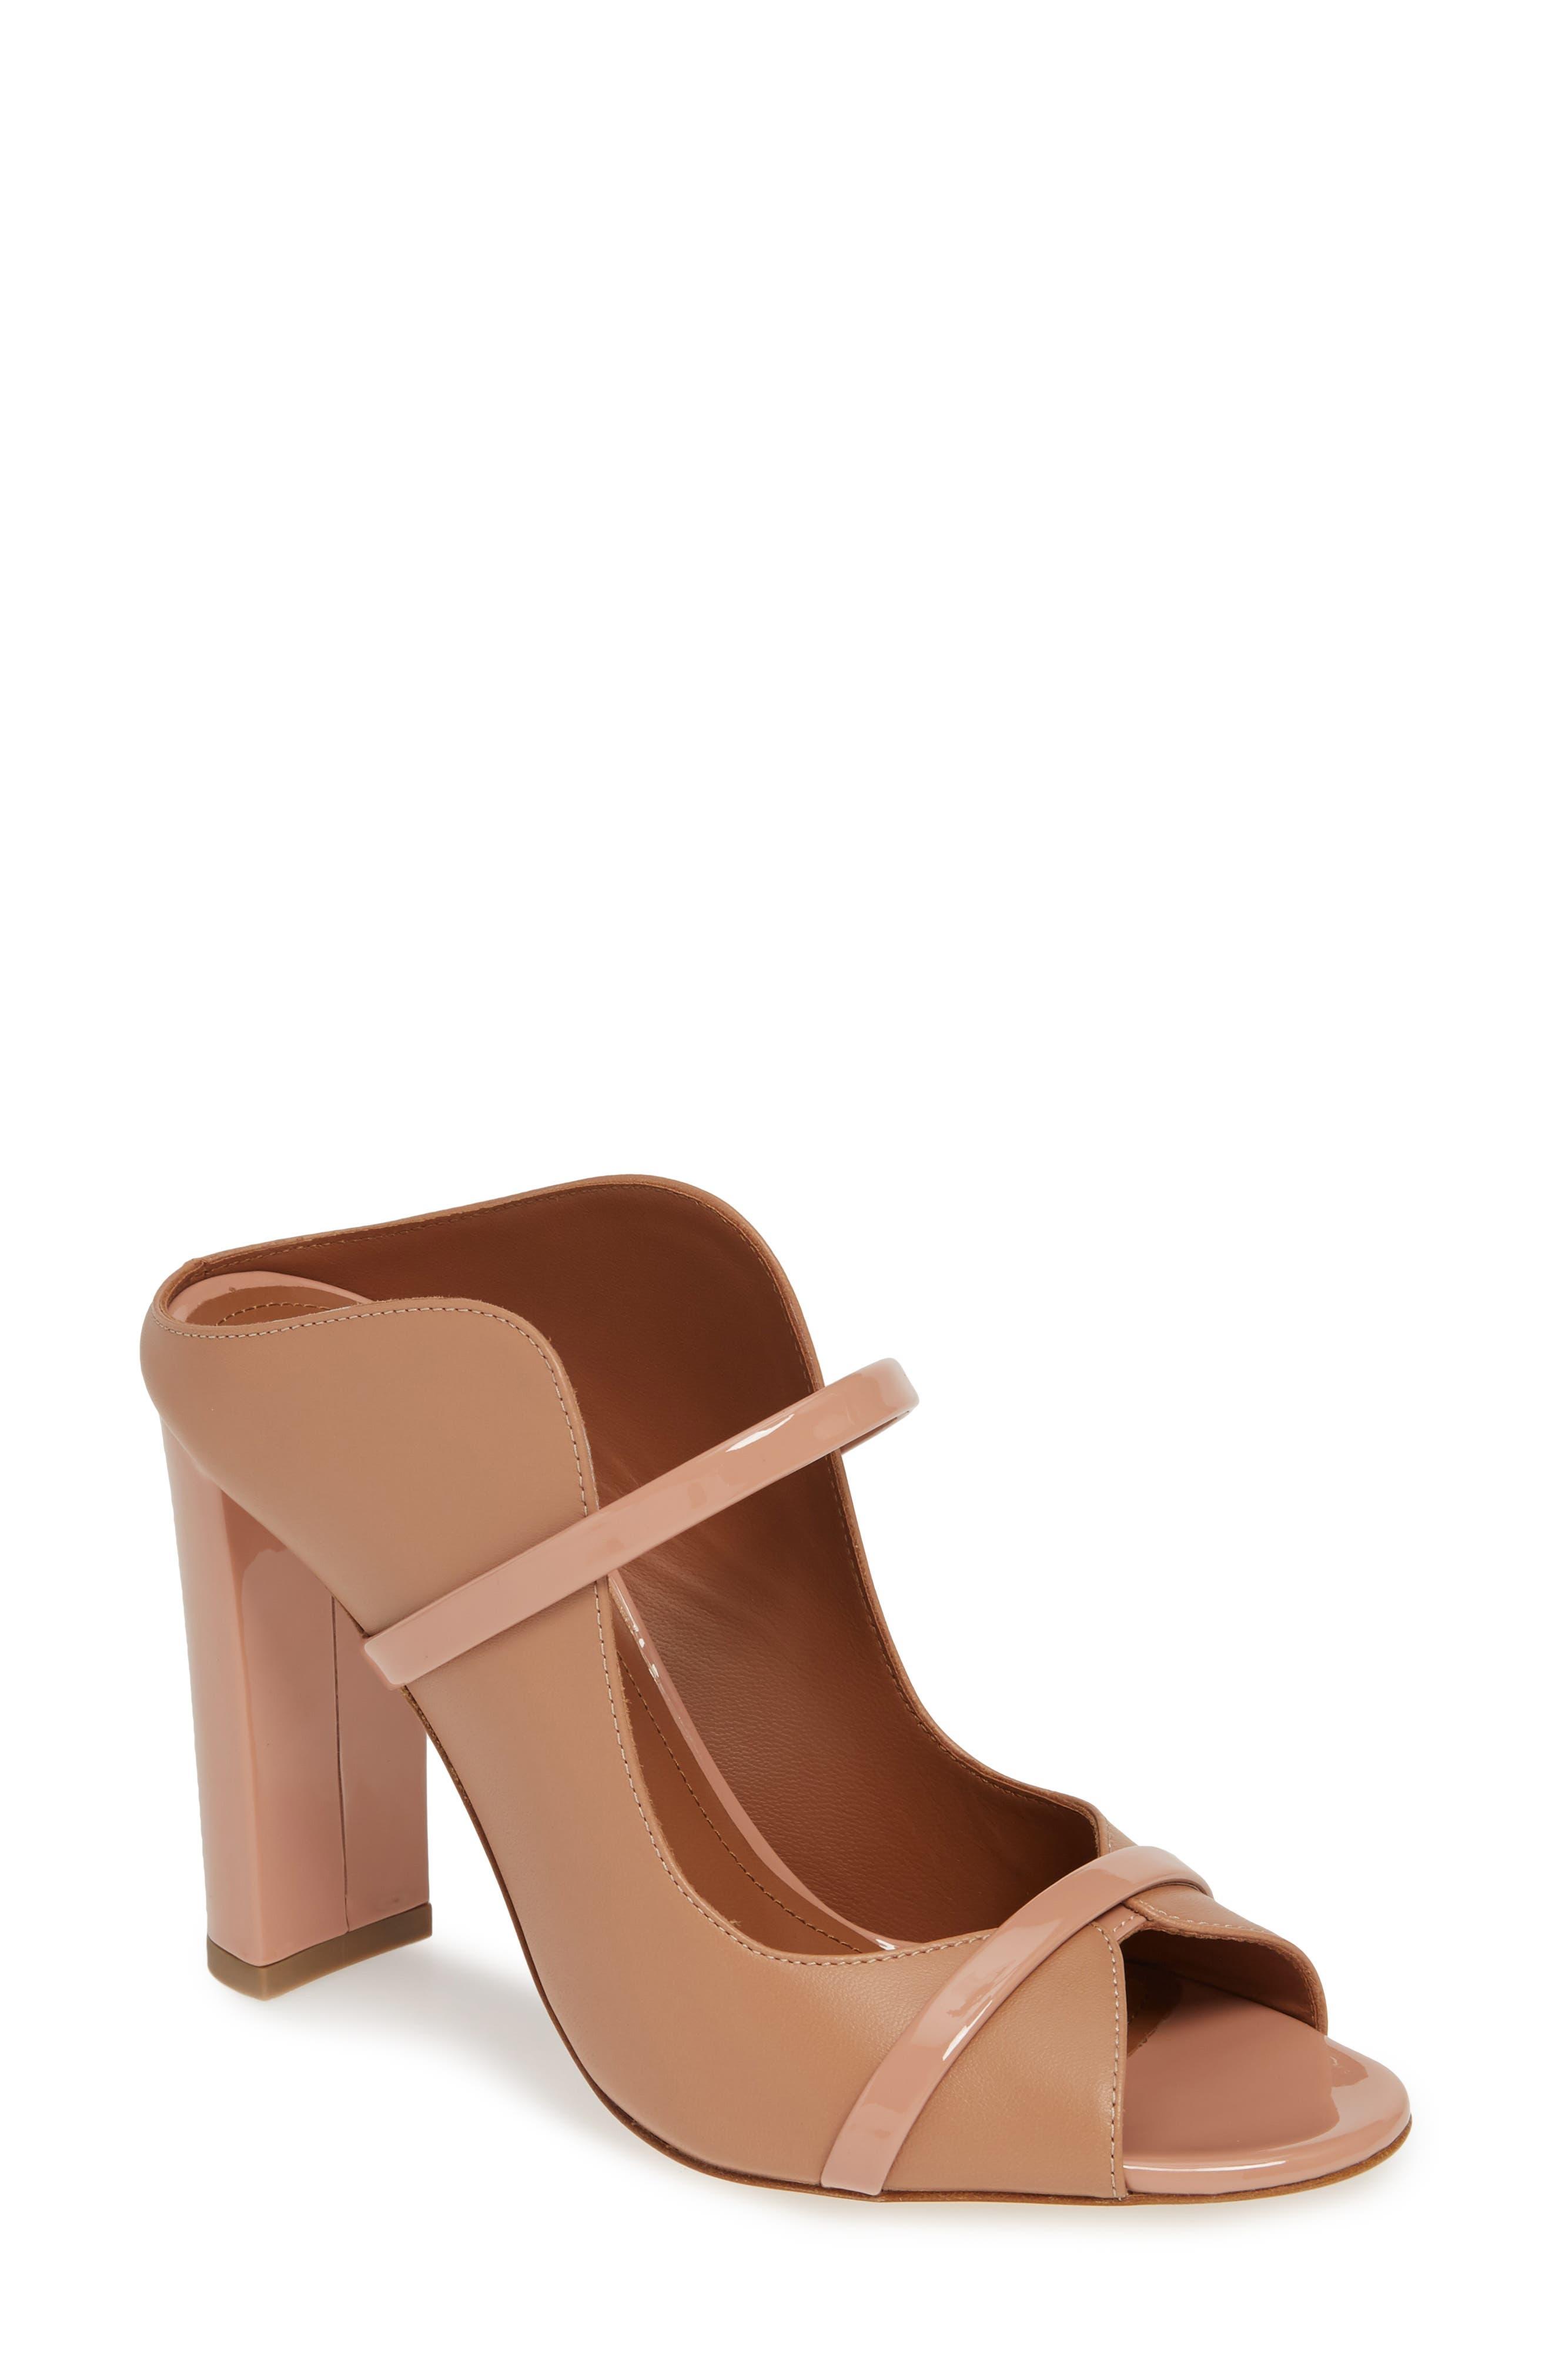 MALONE SOULIERS,                             Norah Block Heel Sandal,                             Main thumbnail 1, color,                             NUDE/ BLUSH